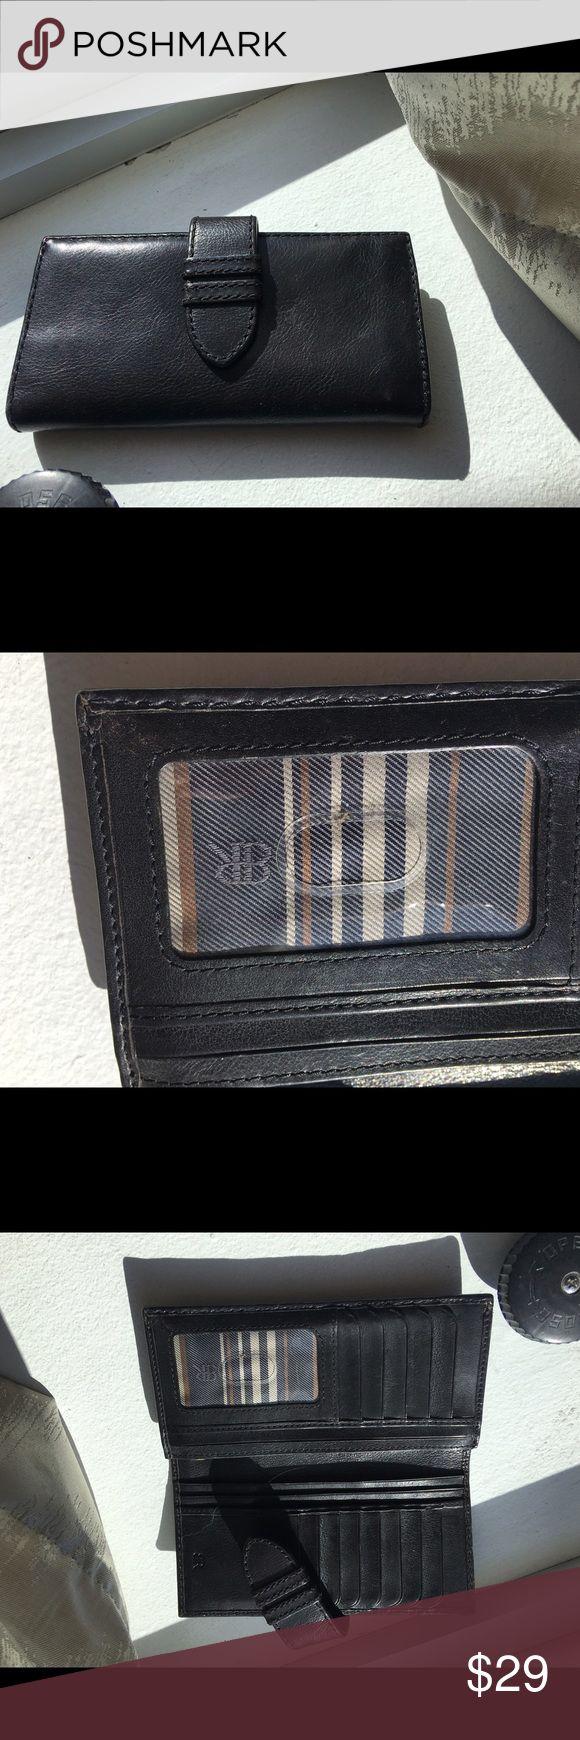 Banana Republic Black Leather Wallet Black leather wallet from Banana Republic Banana Republic Bags Wallets